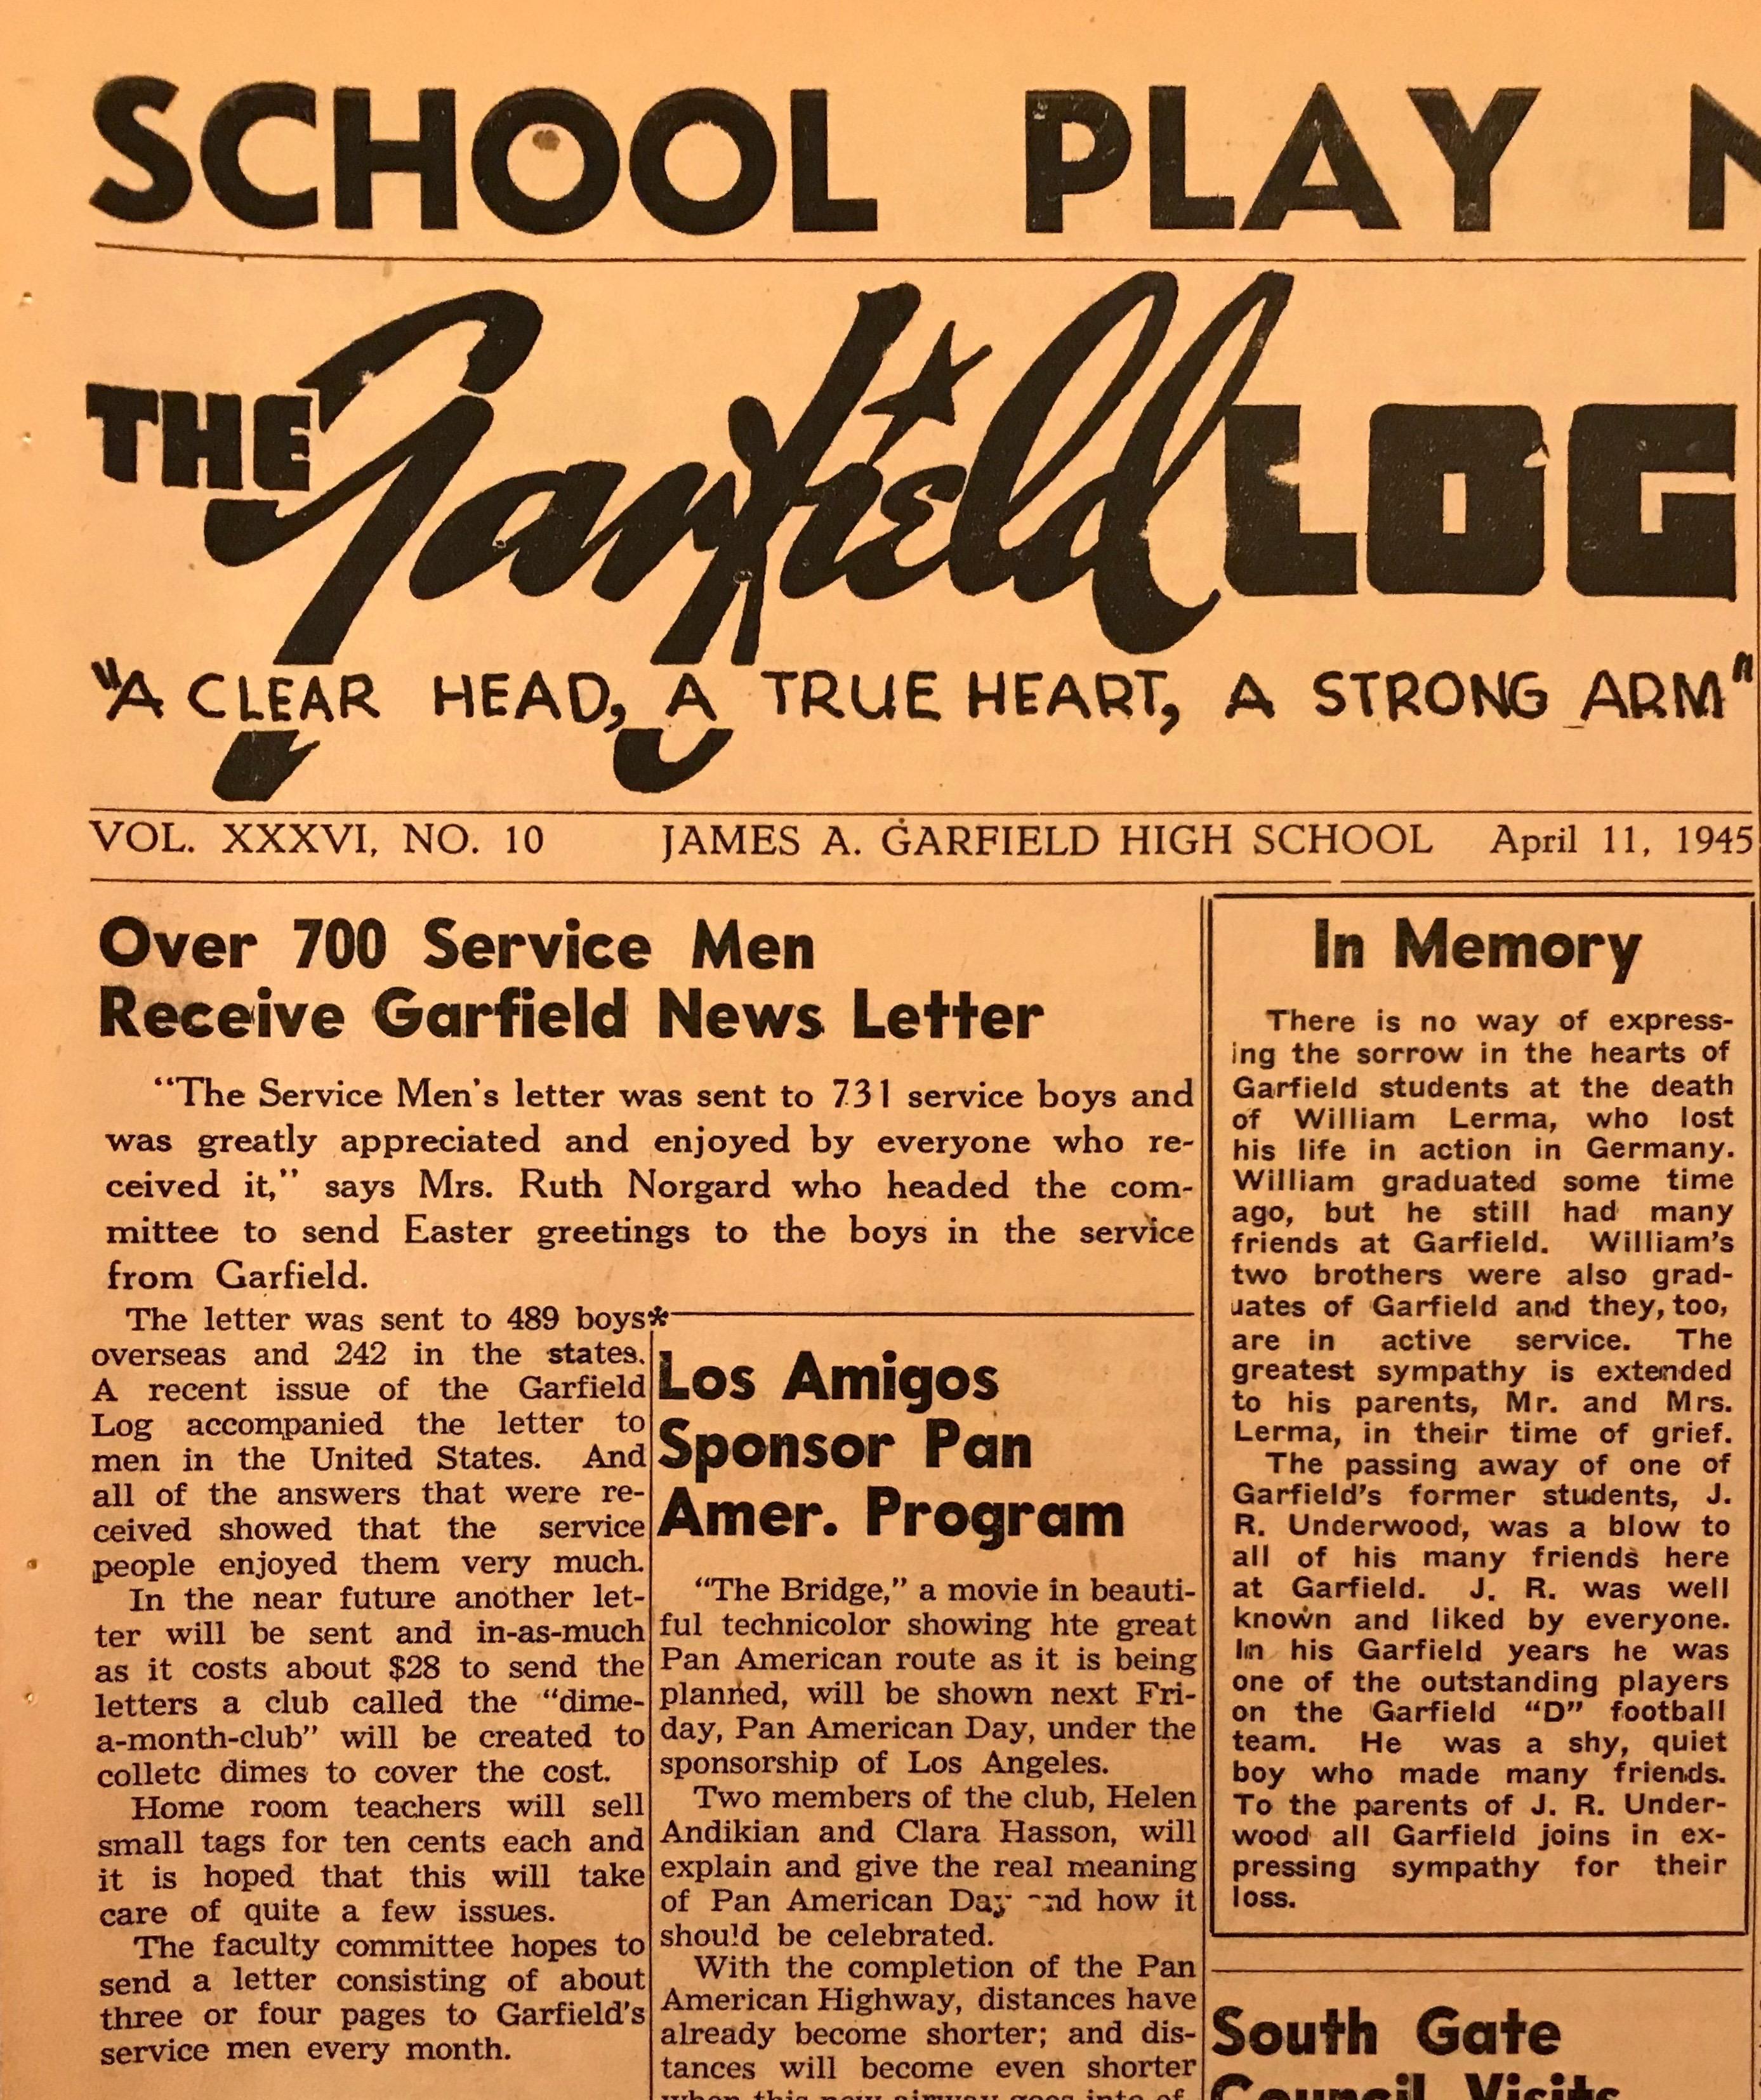 Service men receive Garfield News